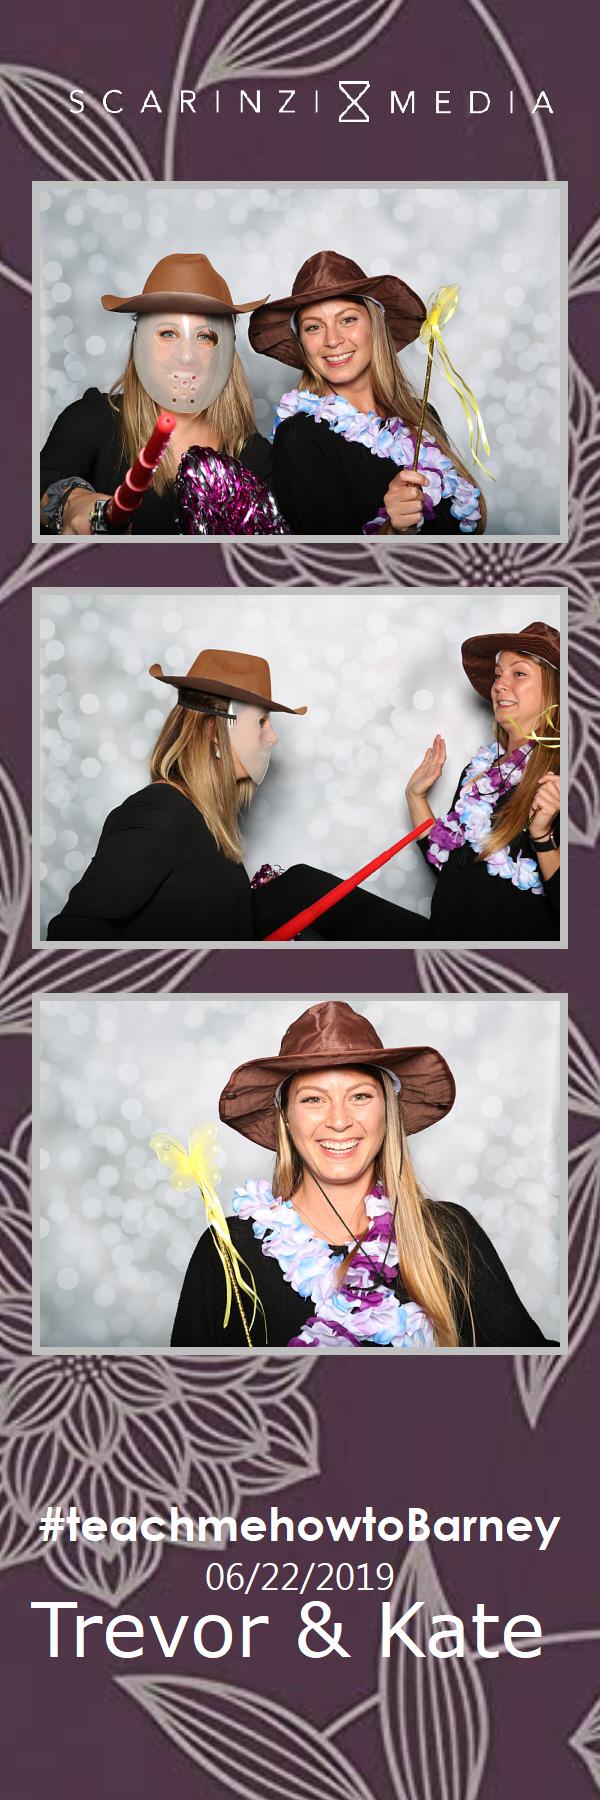 2019.06.22 - Barney Wedding PHOTOBOOTH27.jpg